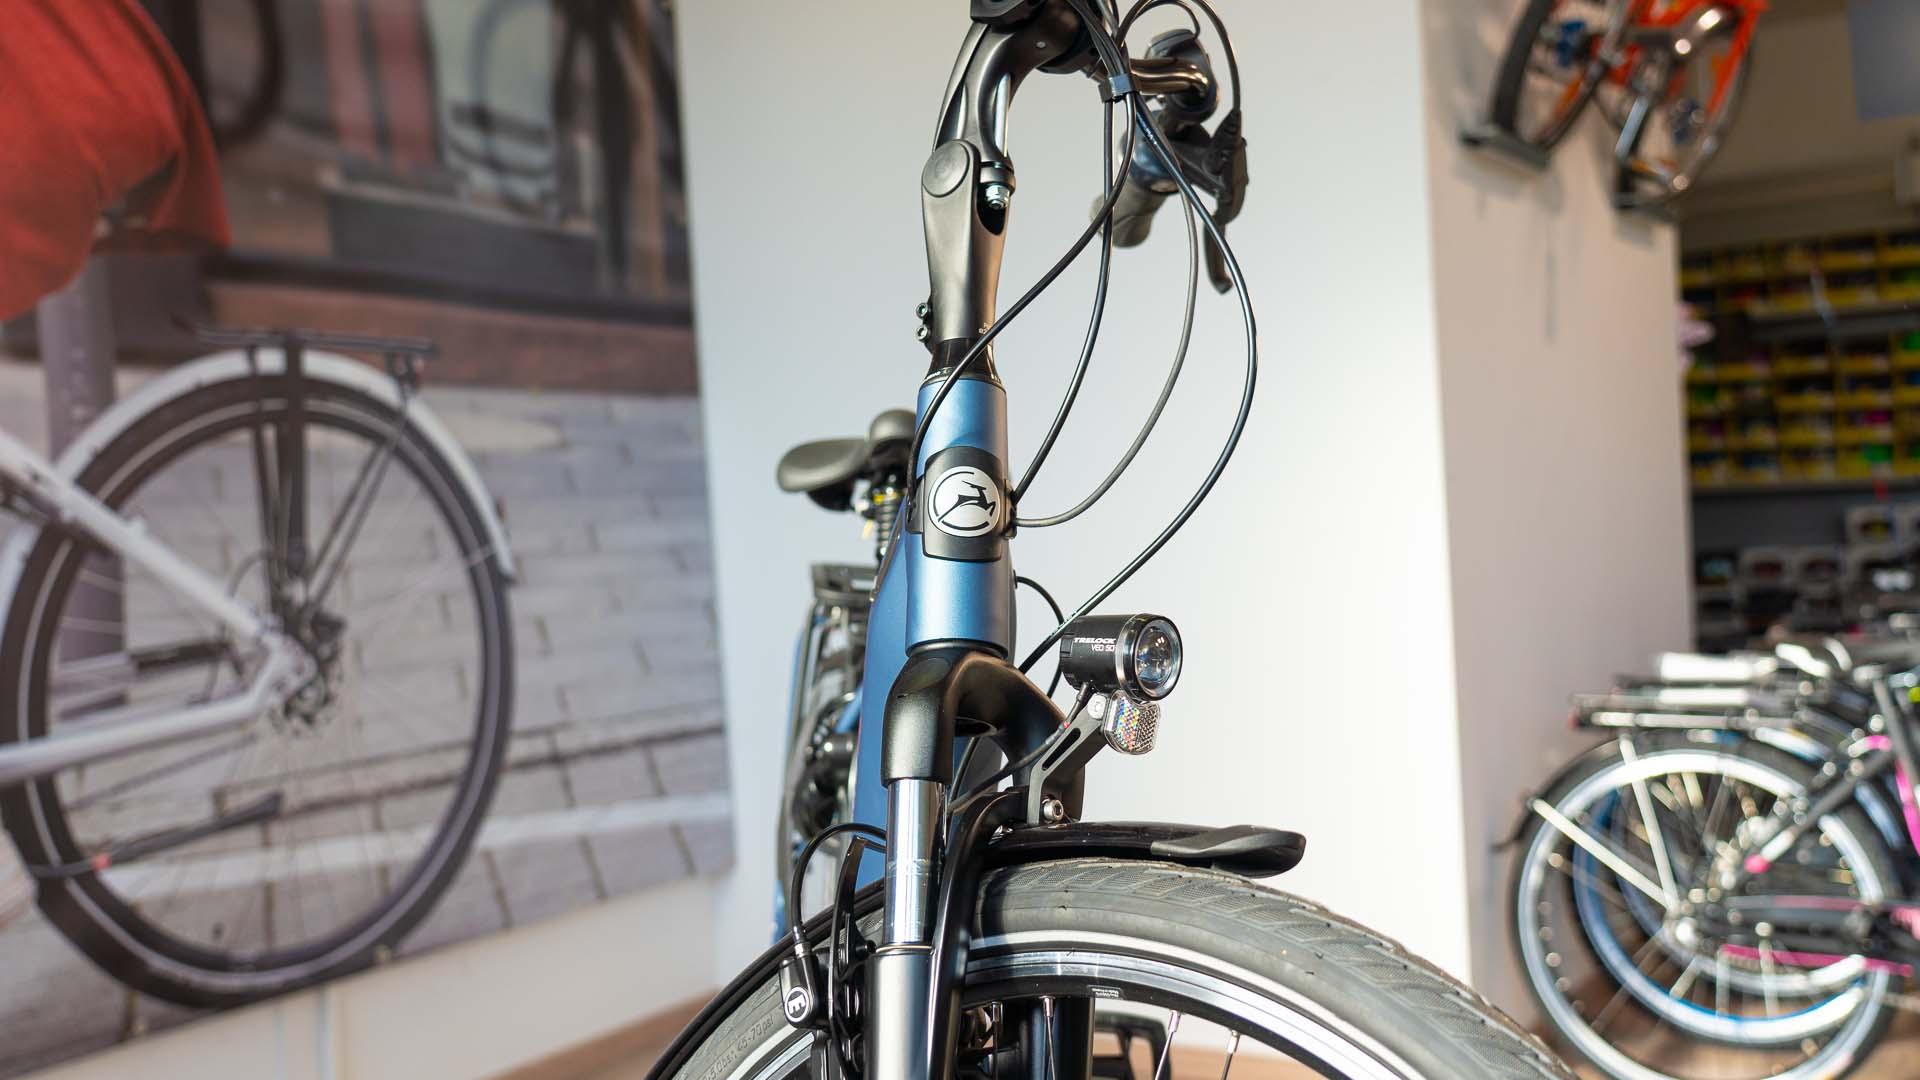 Fahrradzentrum Grauthoff Fotoshooting 4